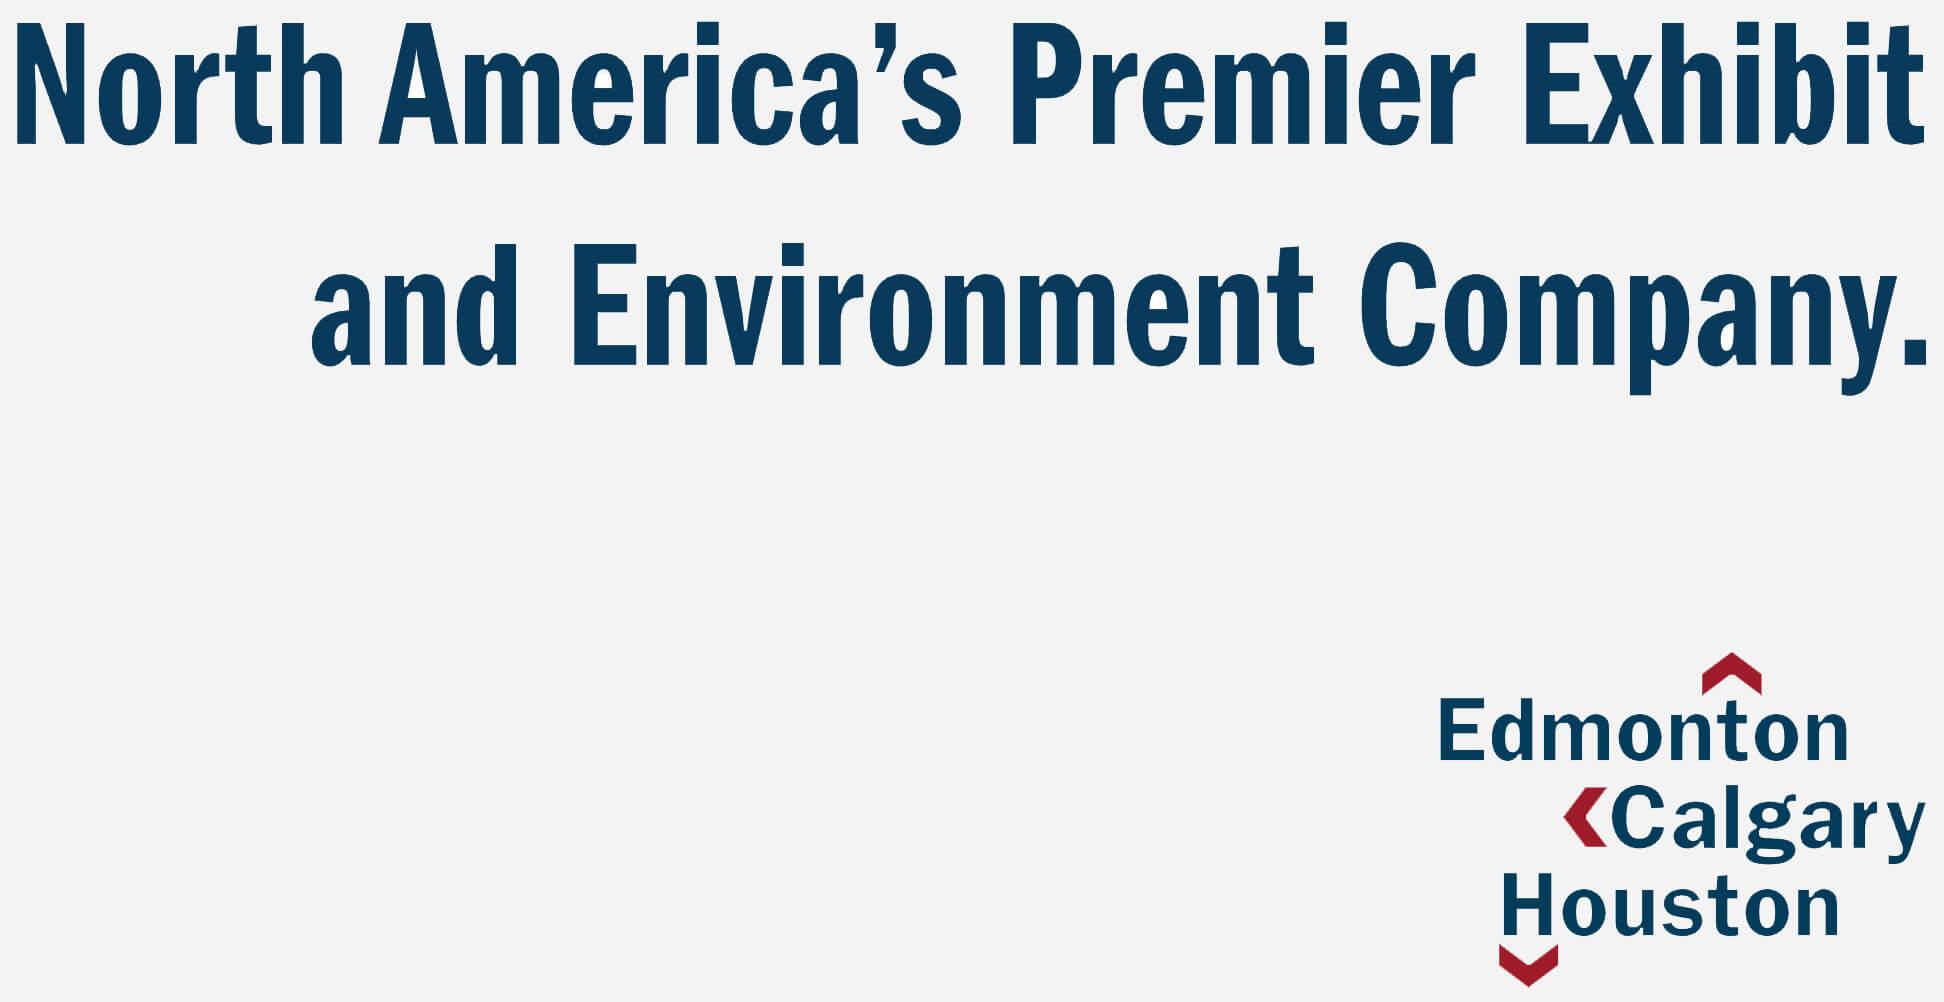 North Americas Premier Exhibit and Environment Company